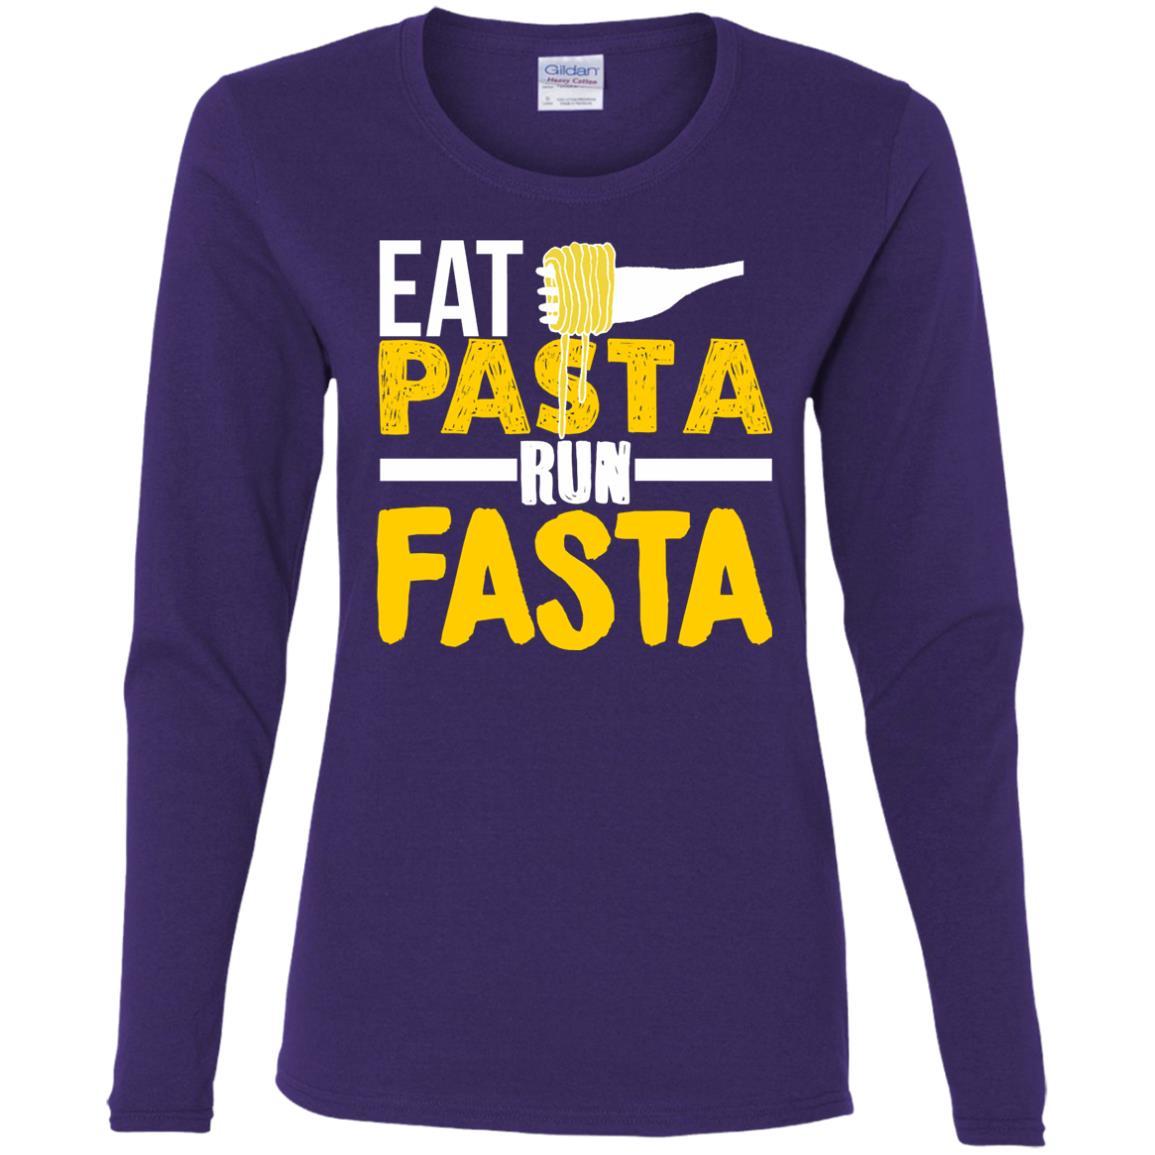 Eat Pasta Run Fasta Funny Running Women Long Sleeve T-Shirt